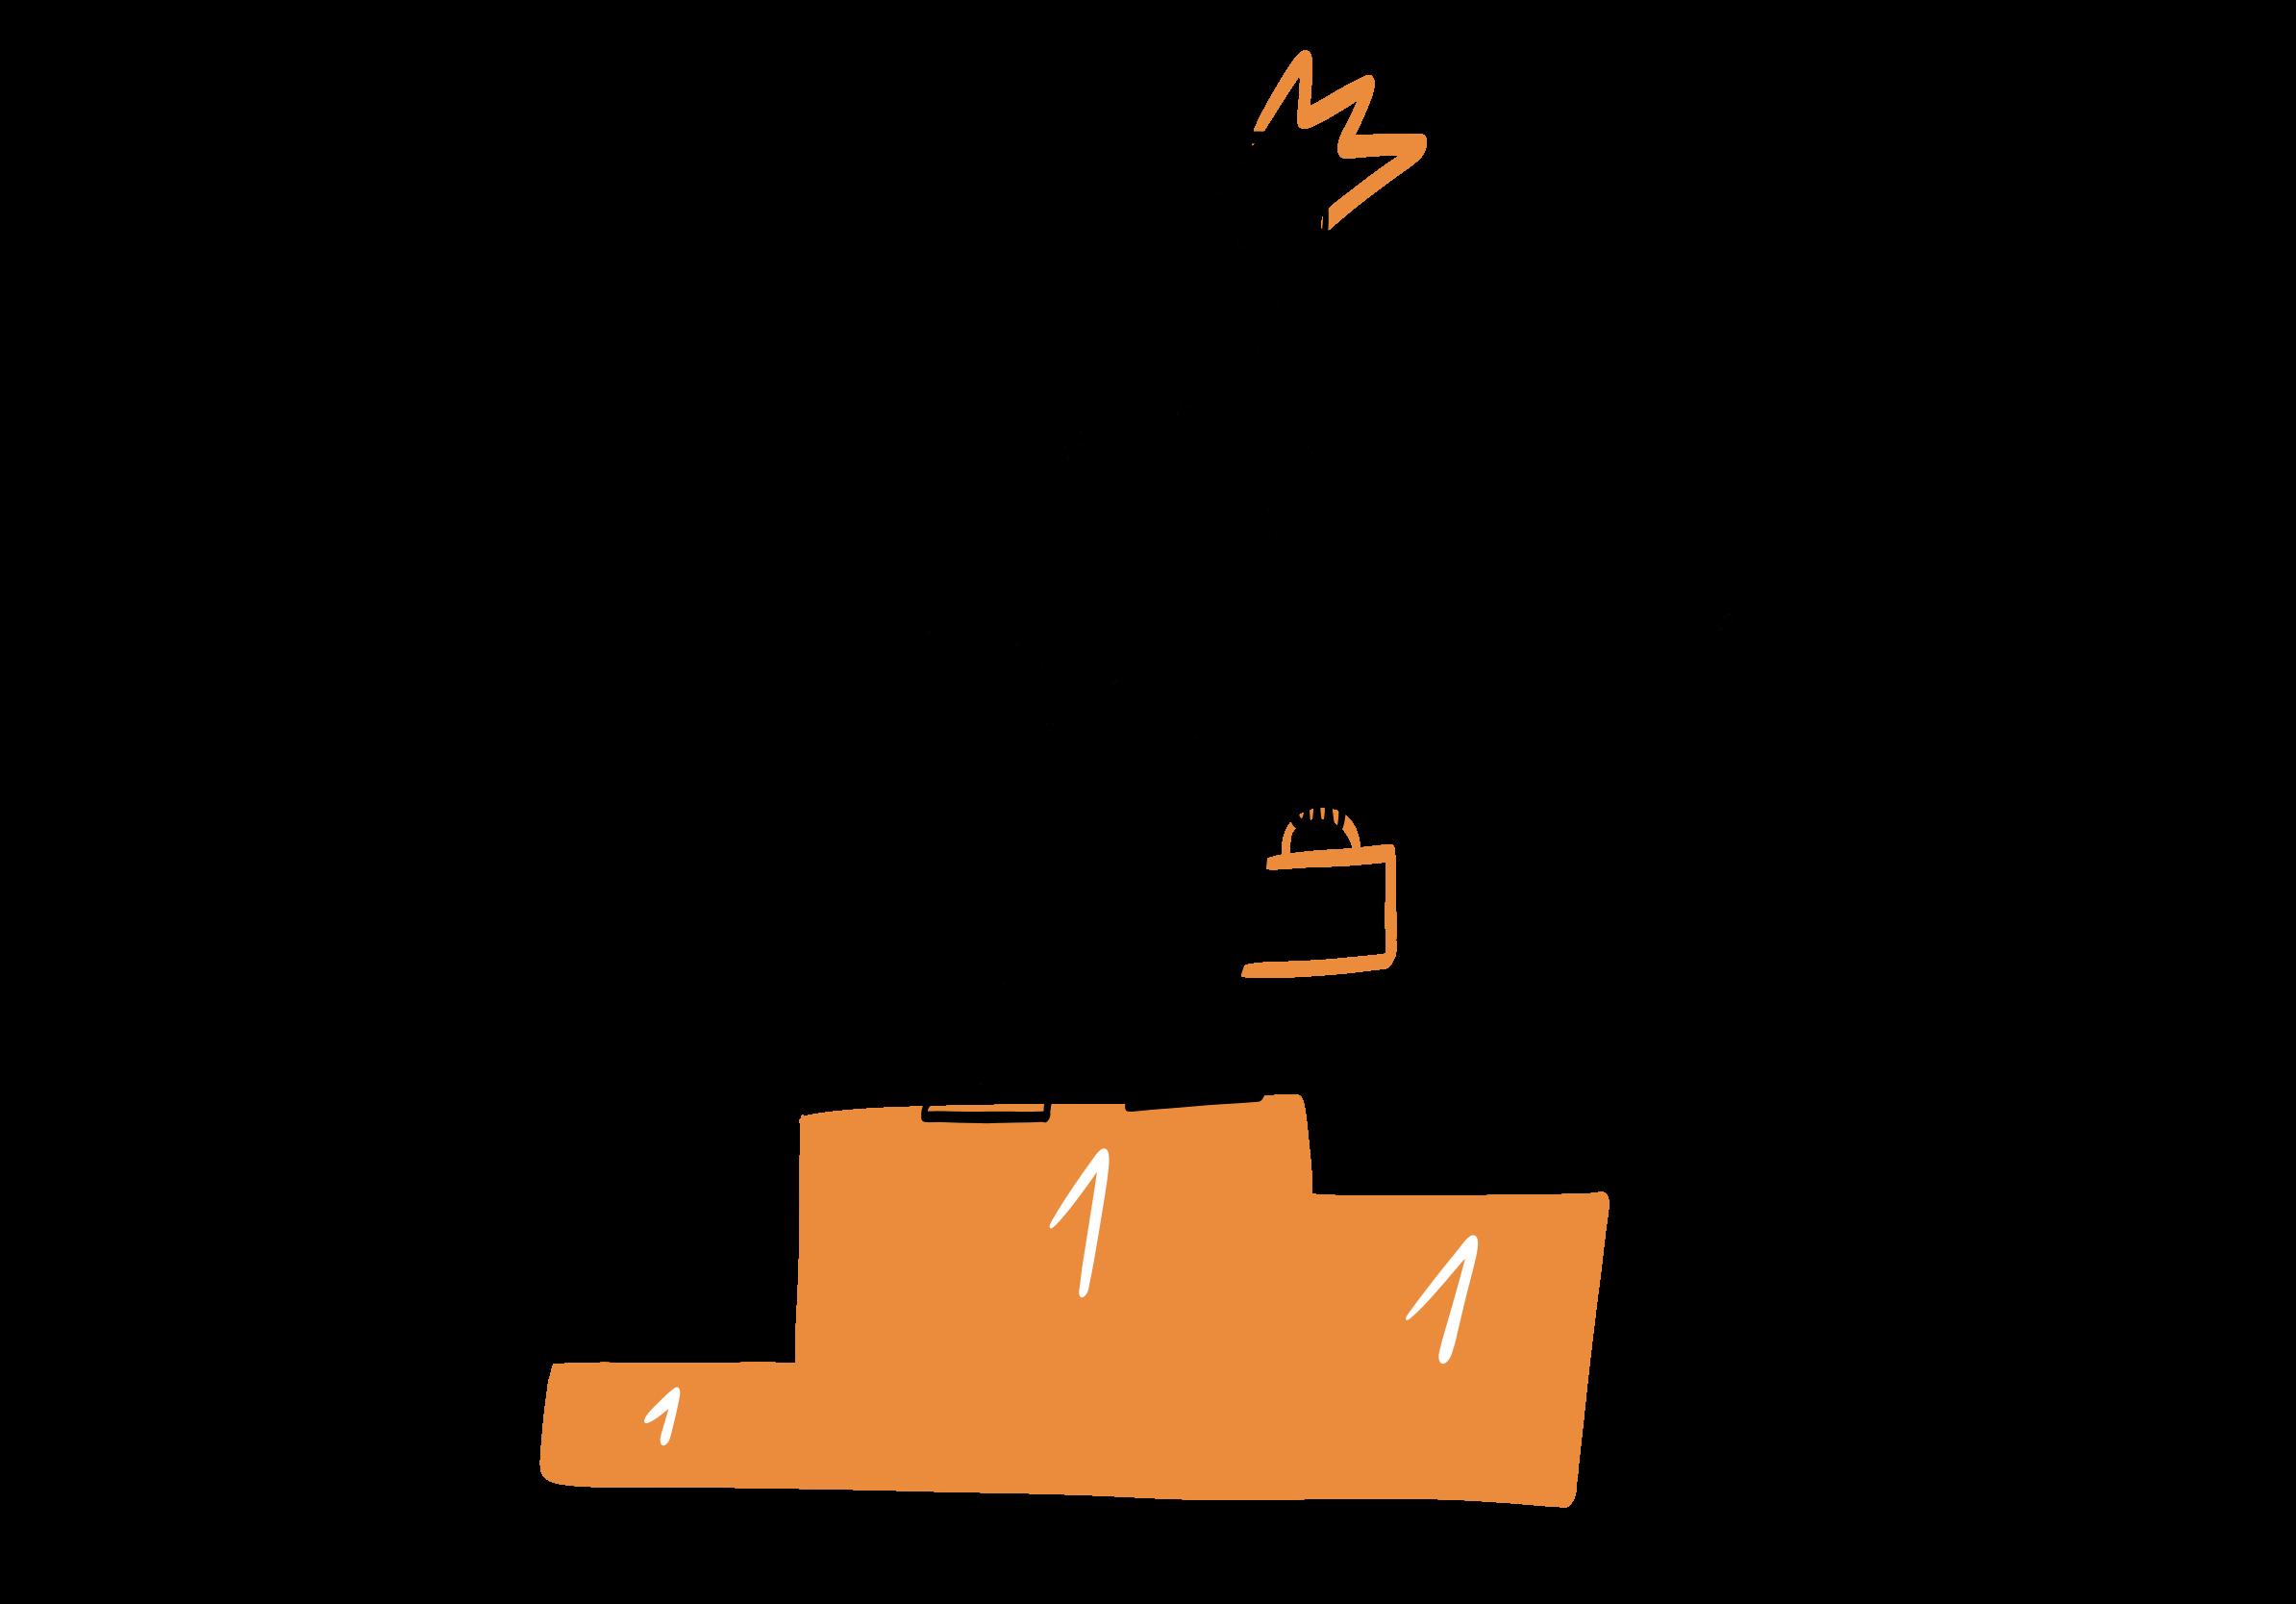 [foundkit]-[web illustration]-[sketches] 12